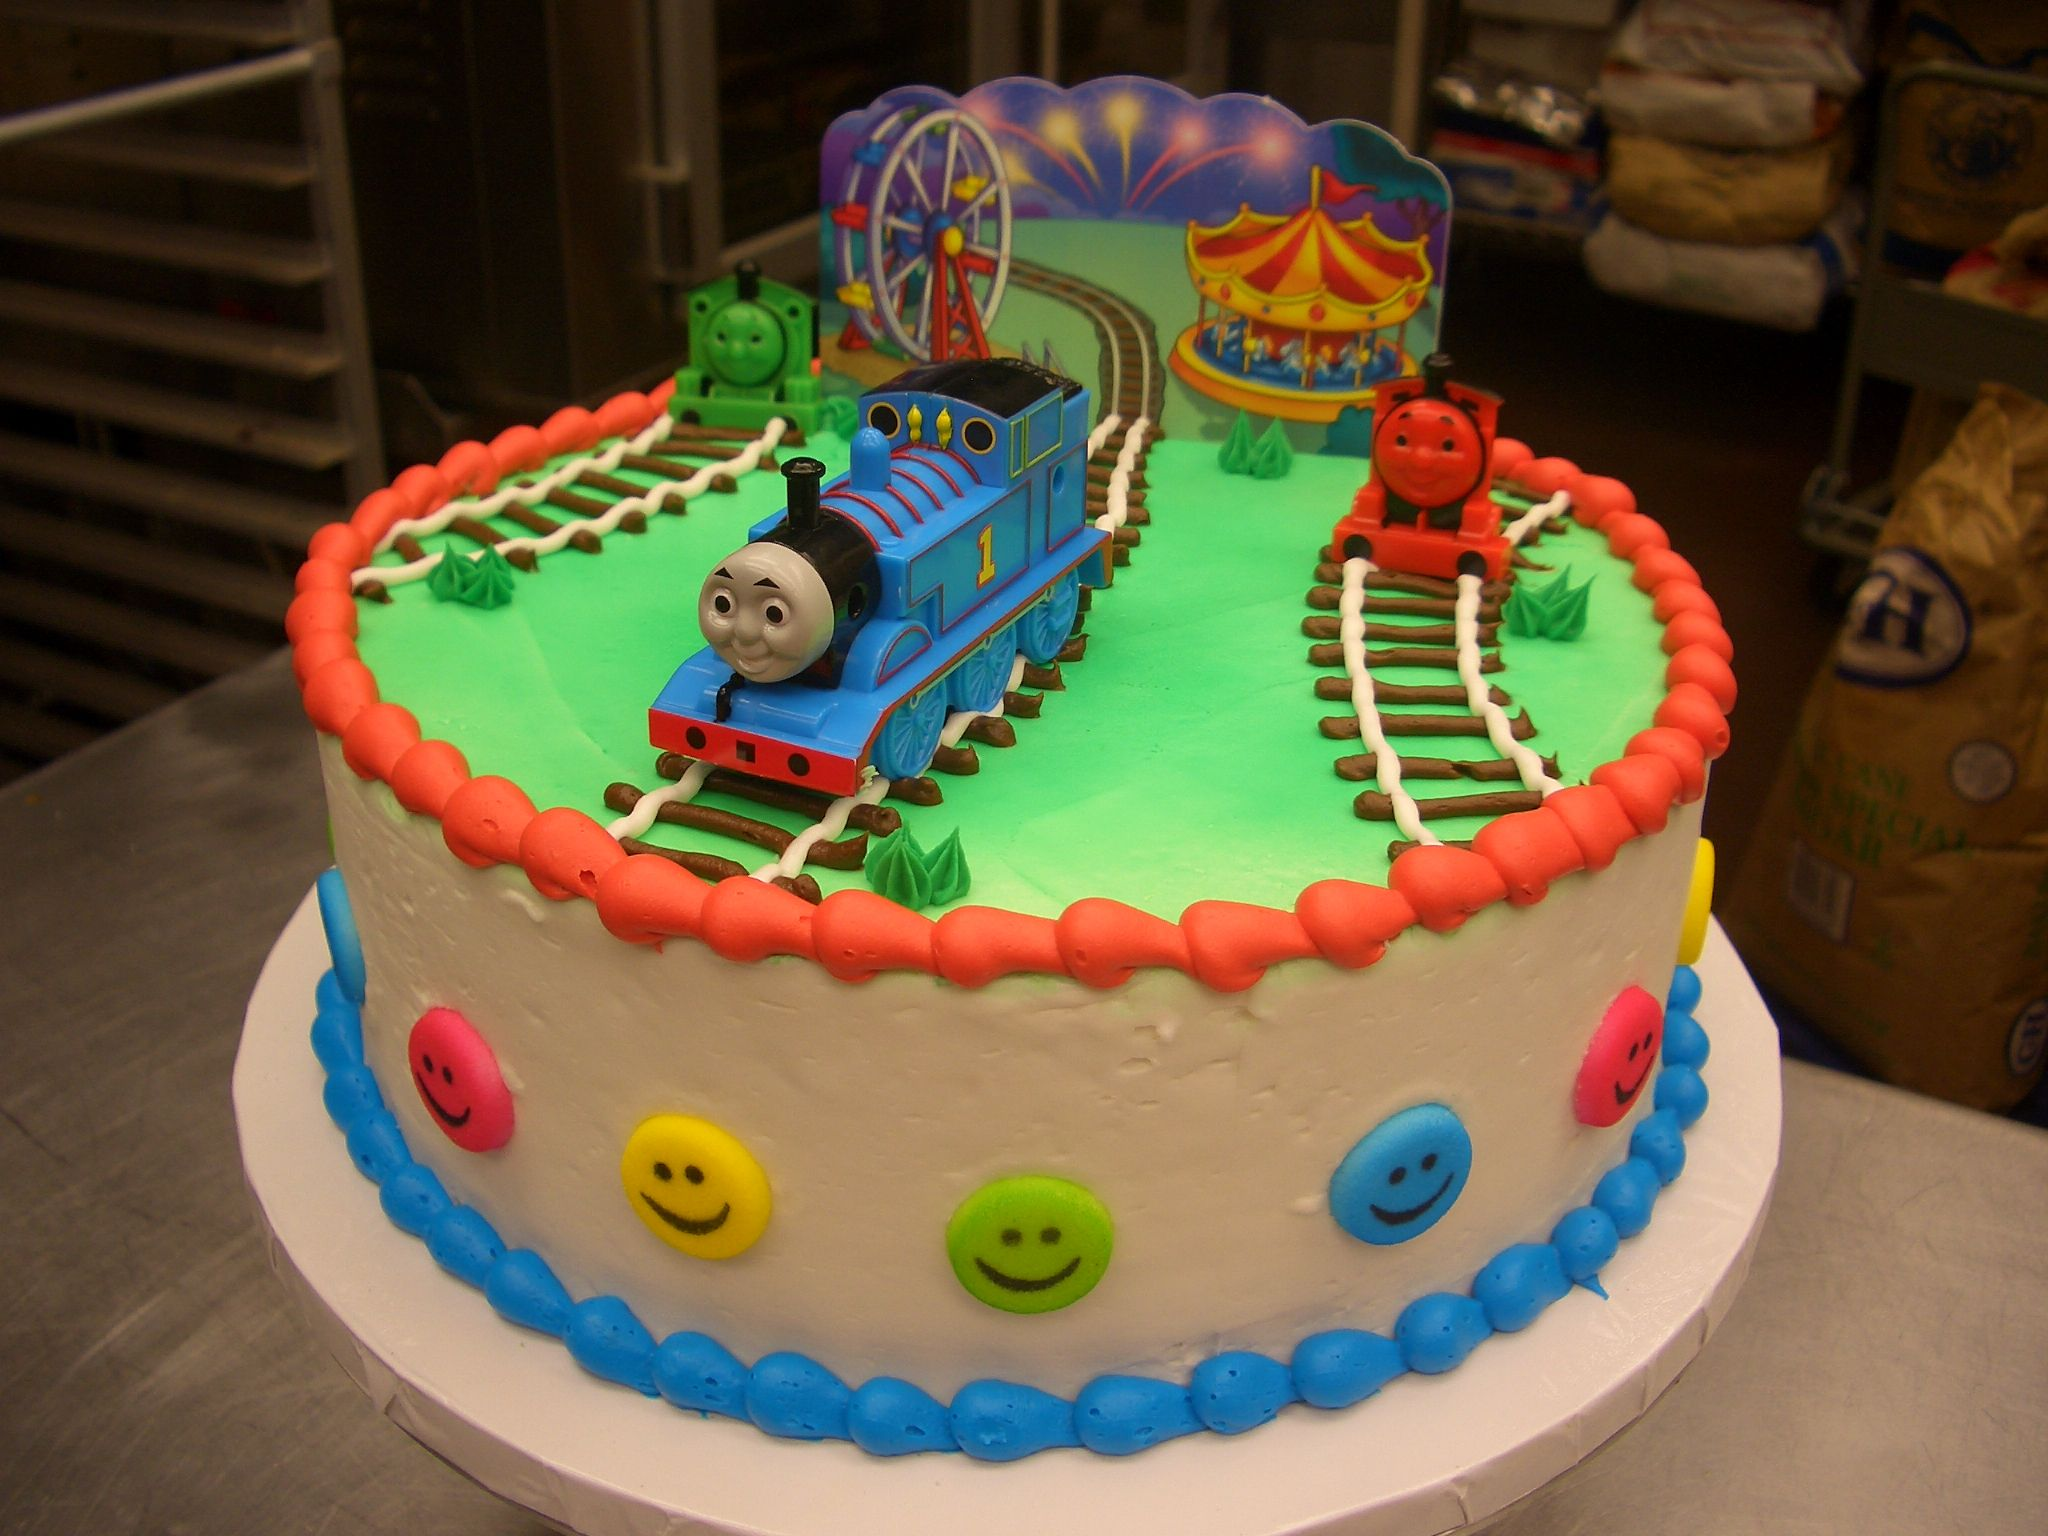 Cake Images Of Thomas The Train : Thomas the Train cakes/cupcakes Pinterest